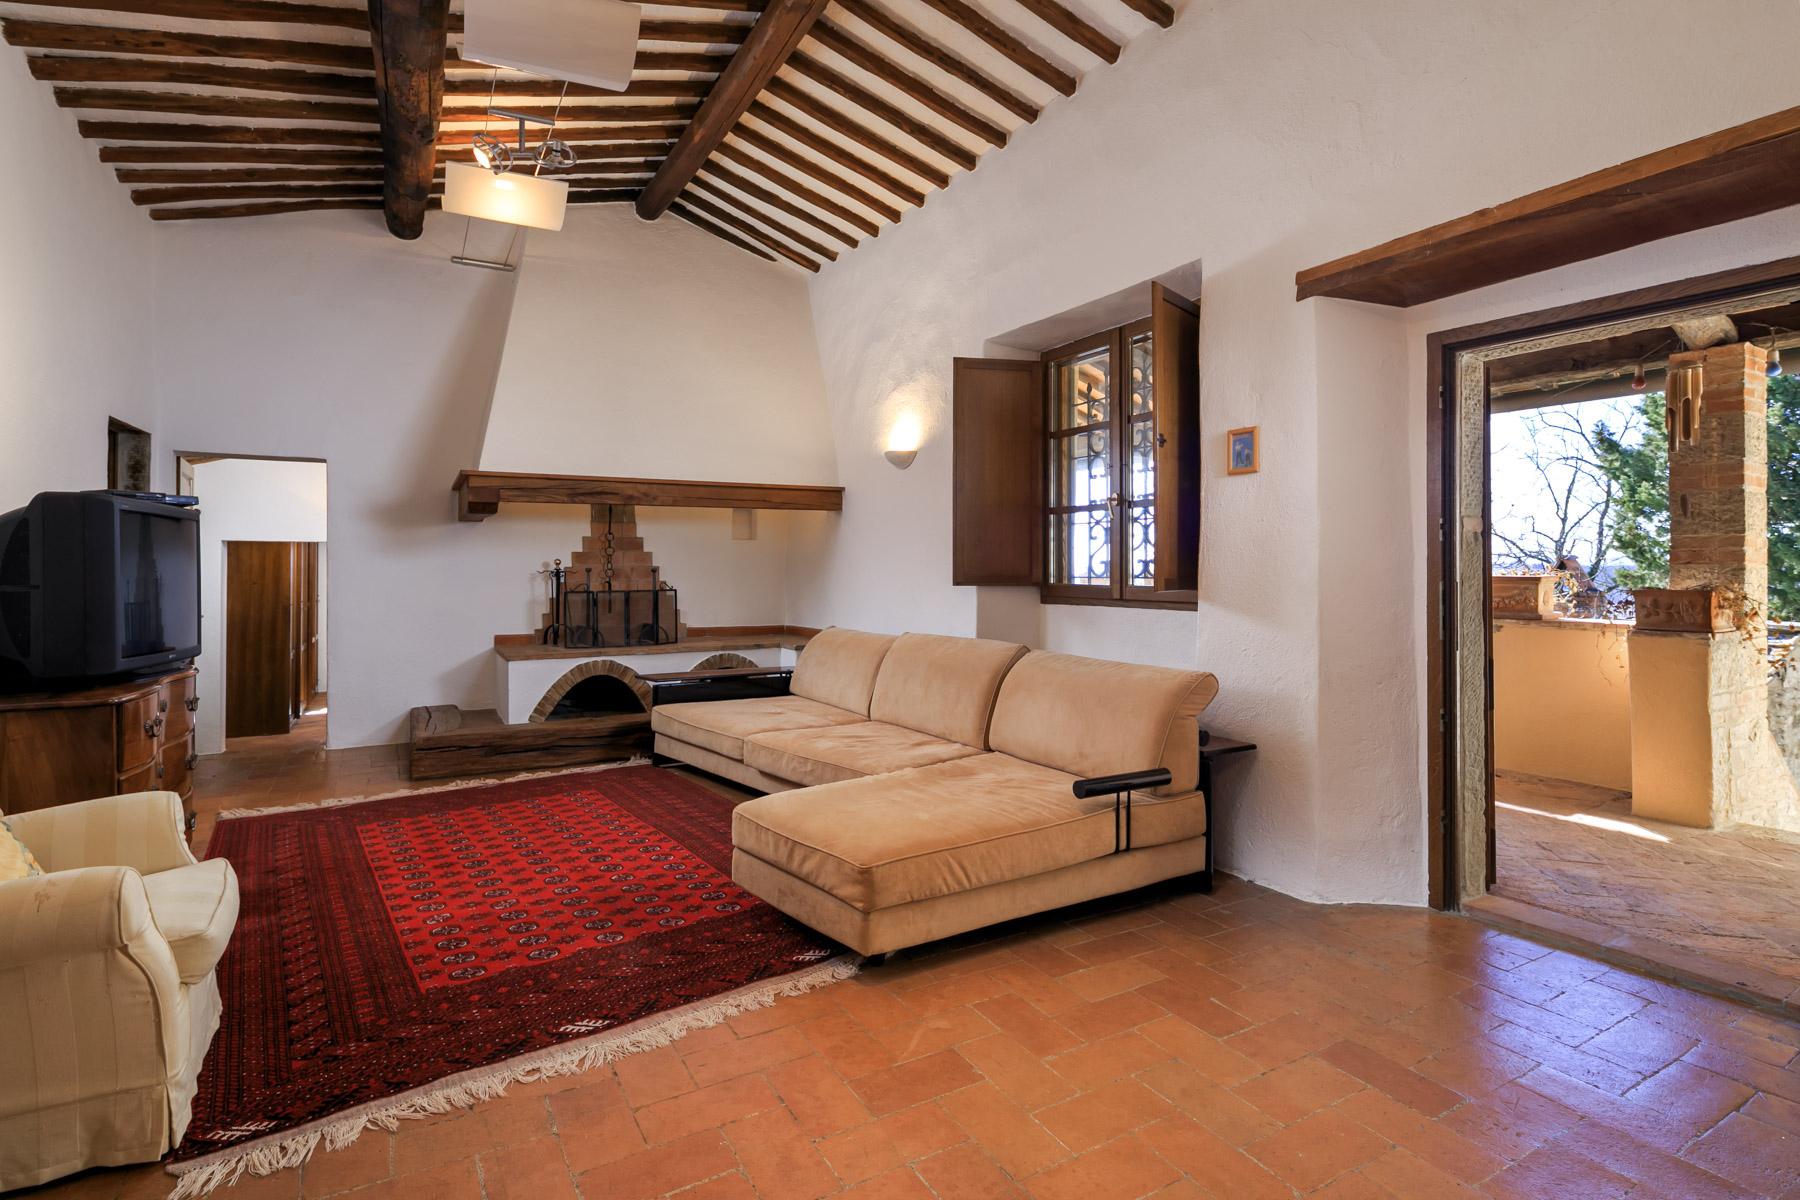 Villa in Vendita a Gaiole In Chianti: 5 locali, 465 mq - Foto 24